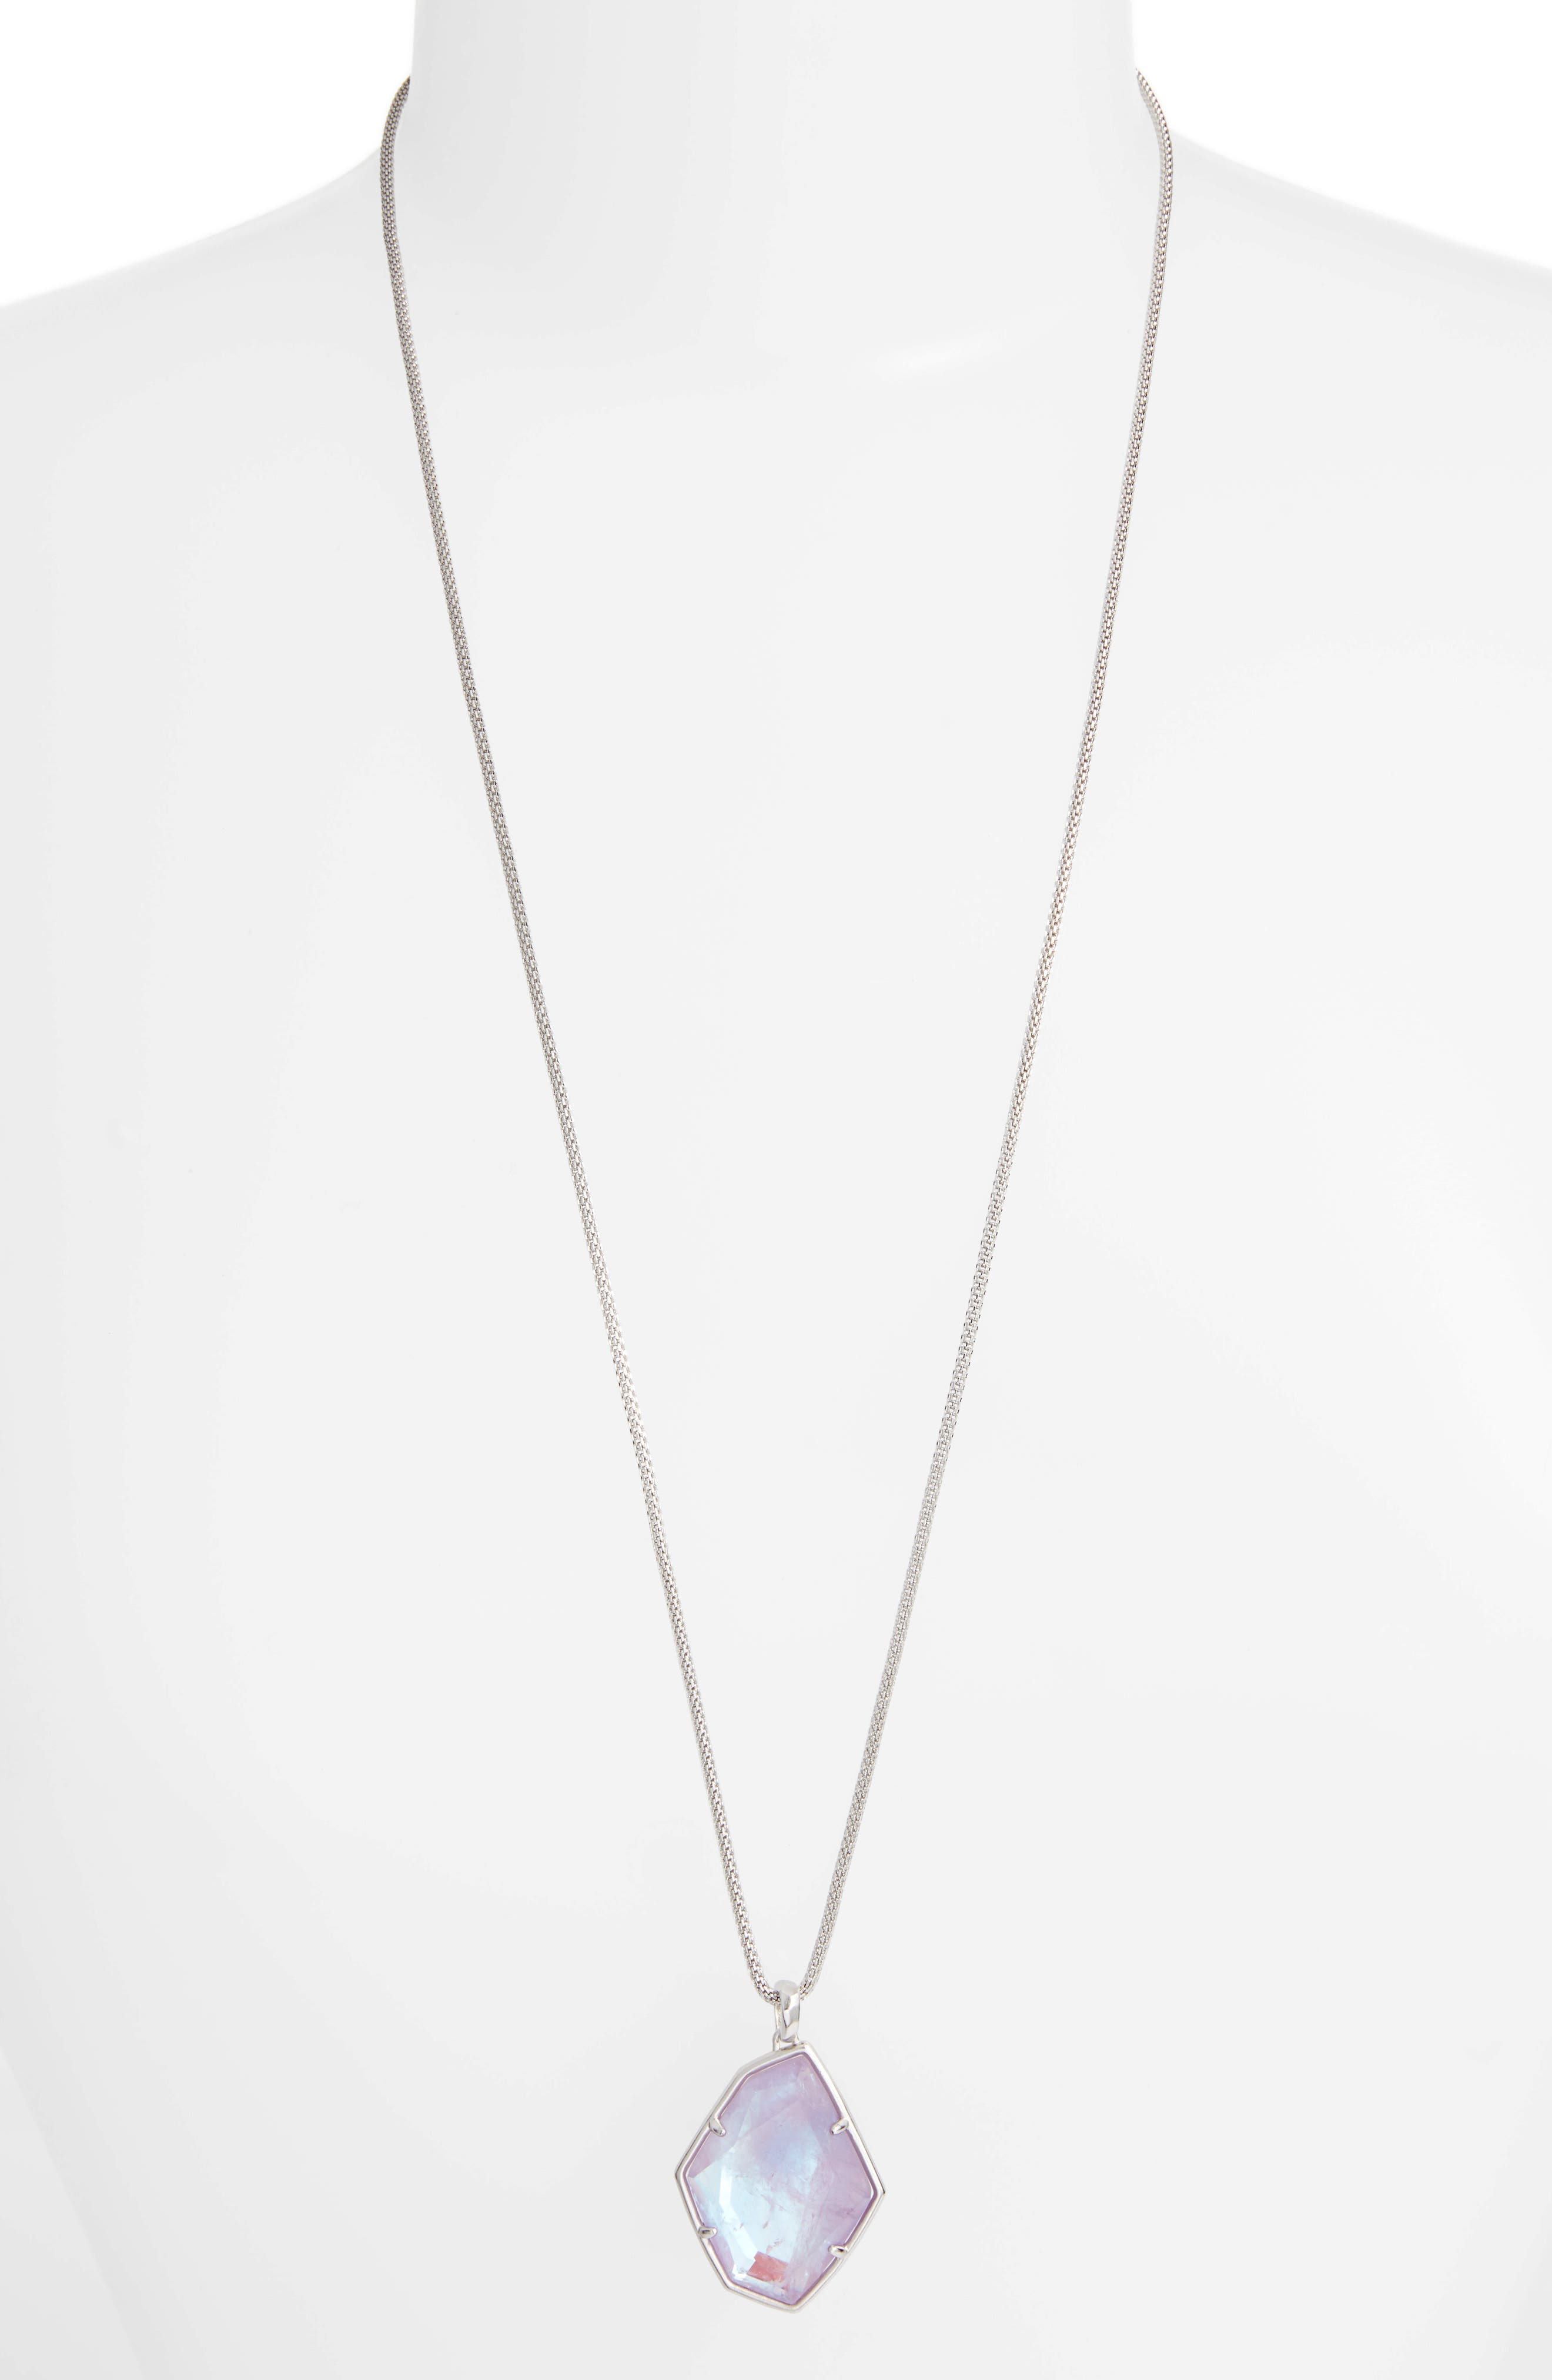 Kalani Long Adjustable Pendant Necklace,                             Main thumbnail 1, color,                             540